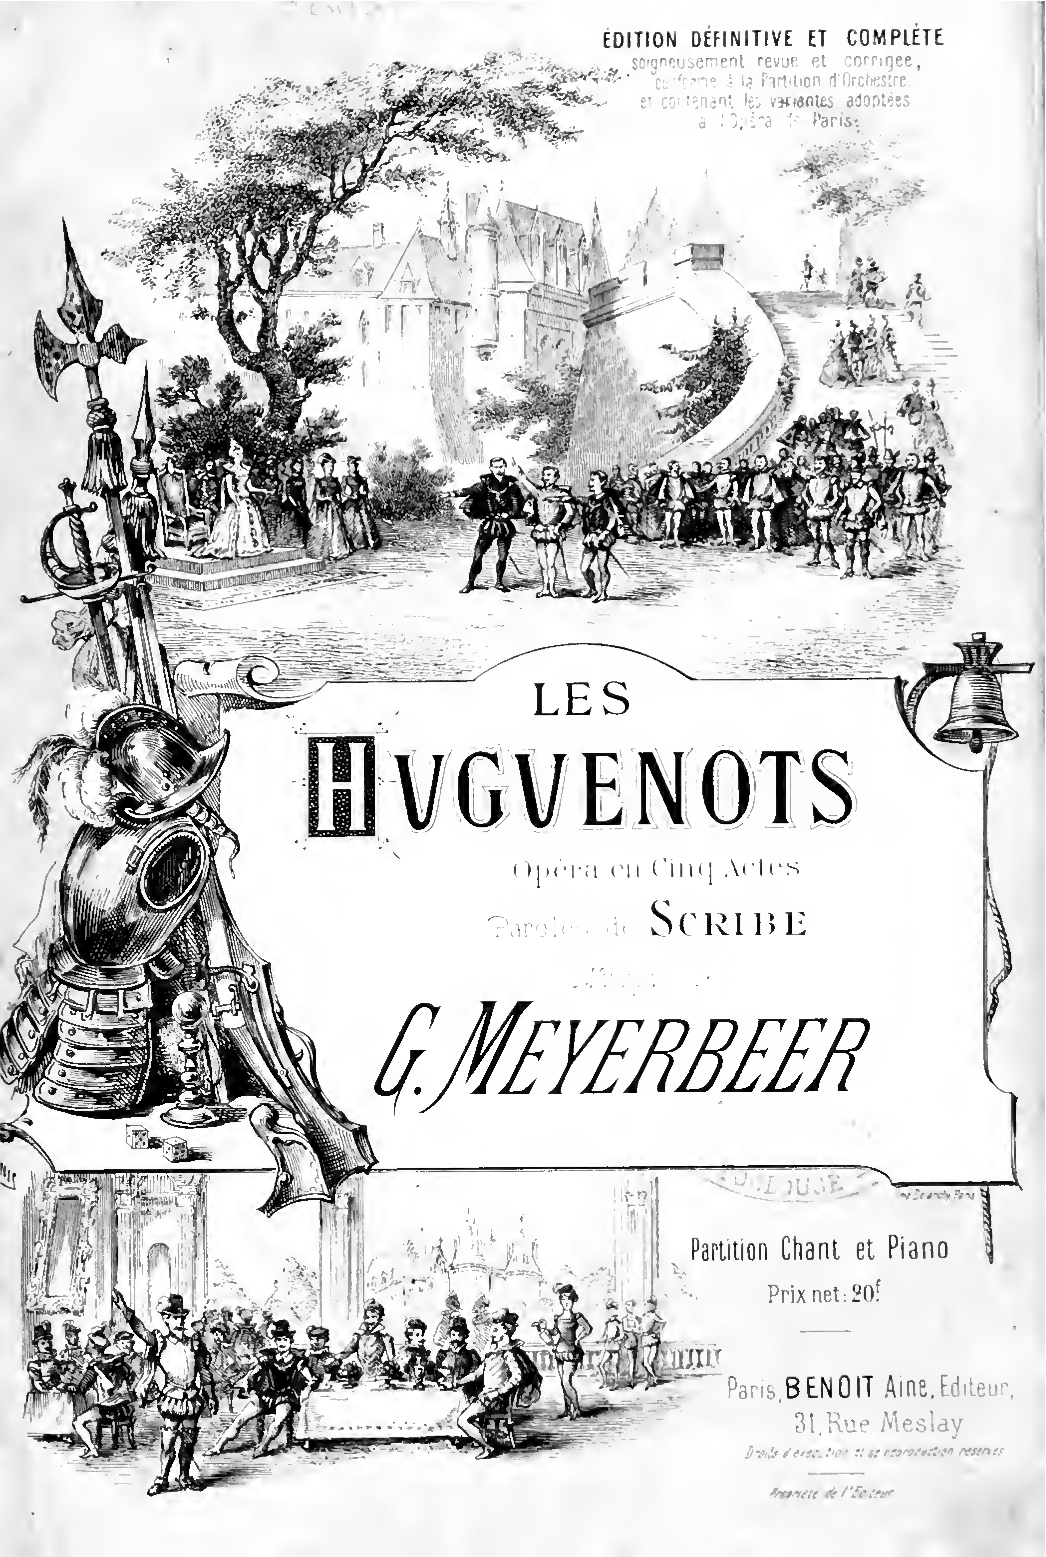 Les Huguenots Wikipdia